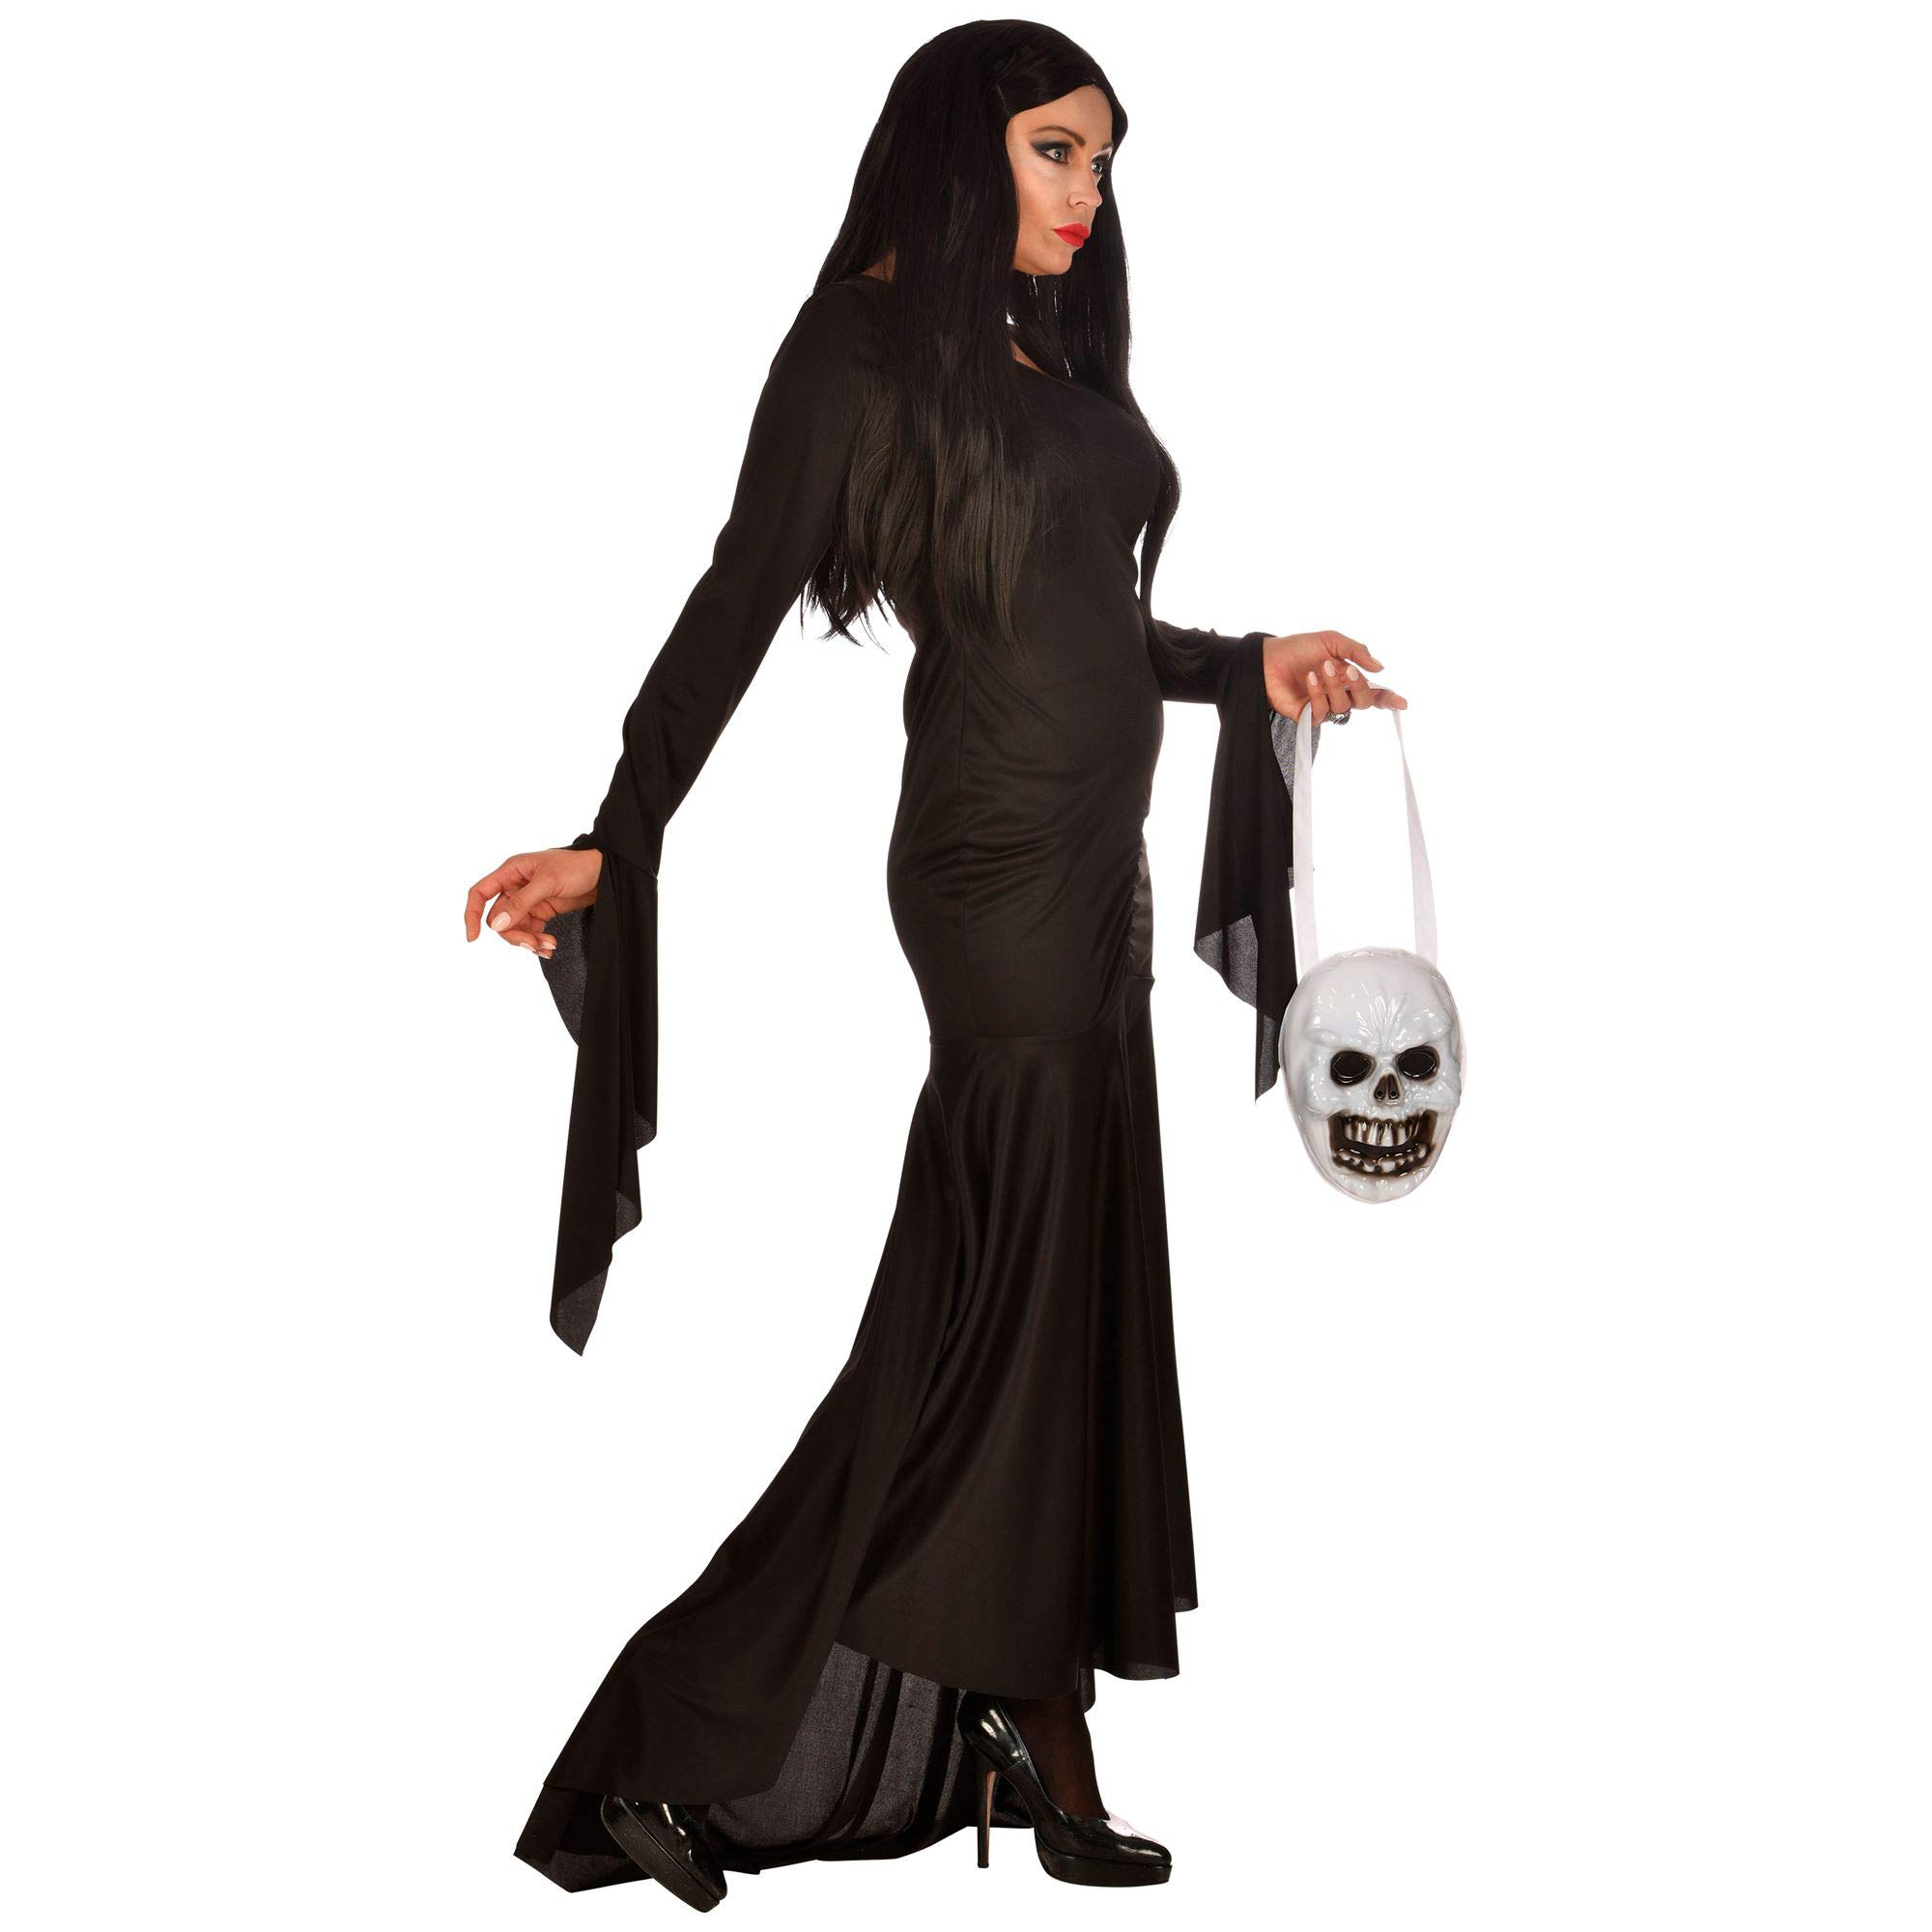 WIDMANN 01873 - Disfraz de Morticia para mujer, color negro, talla ...